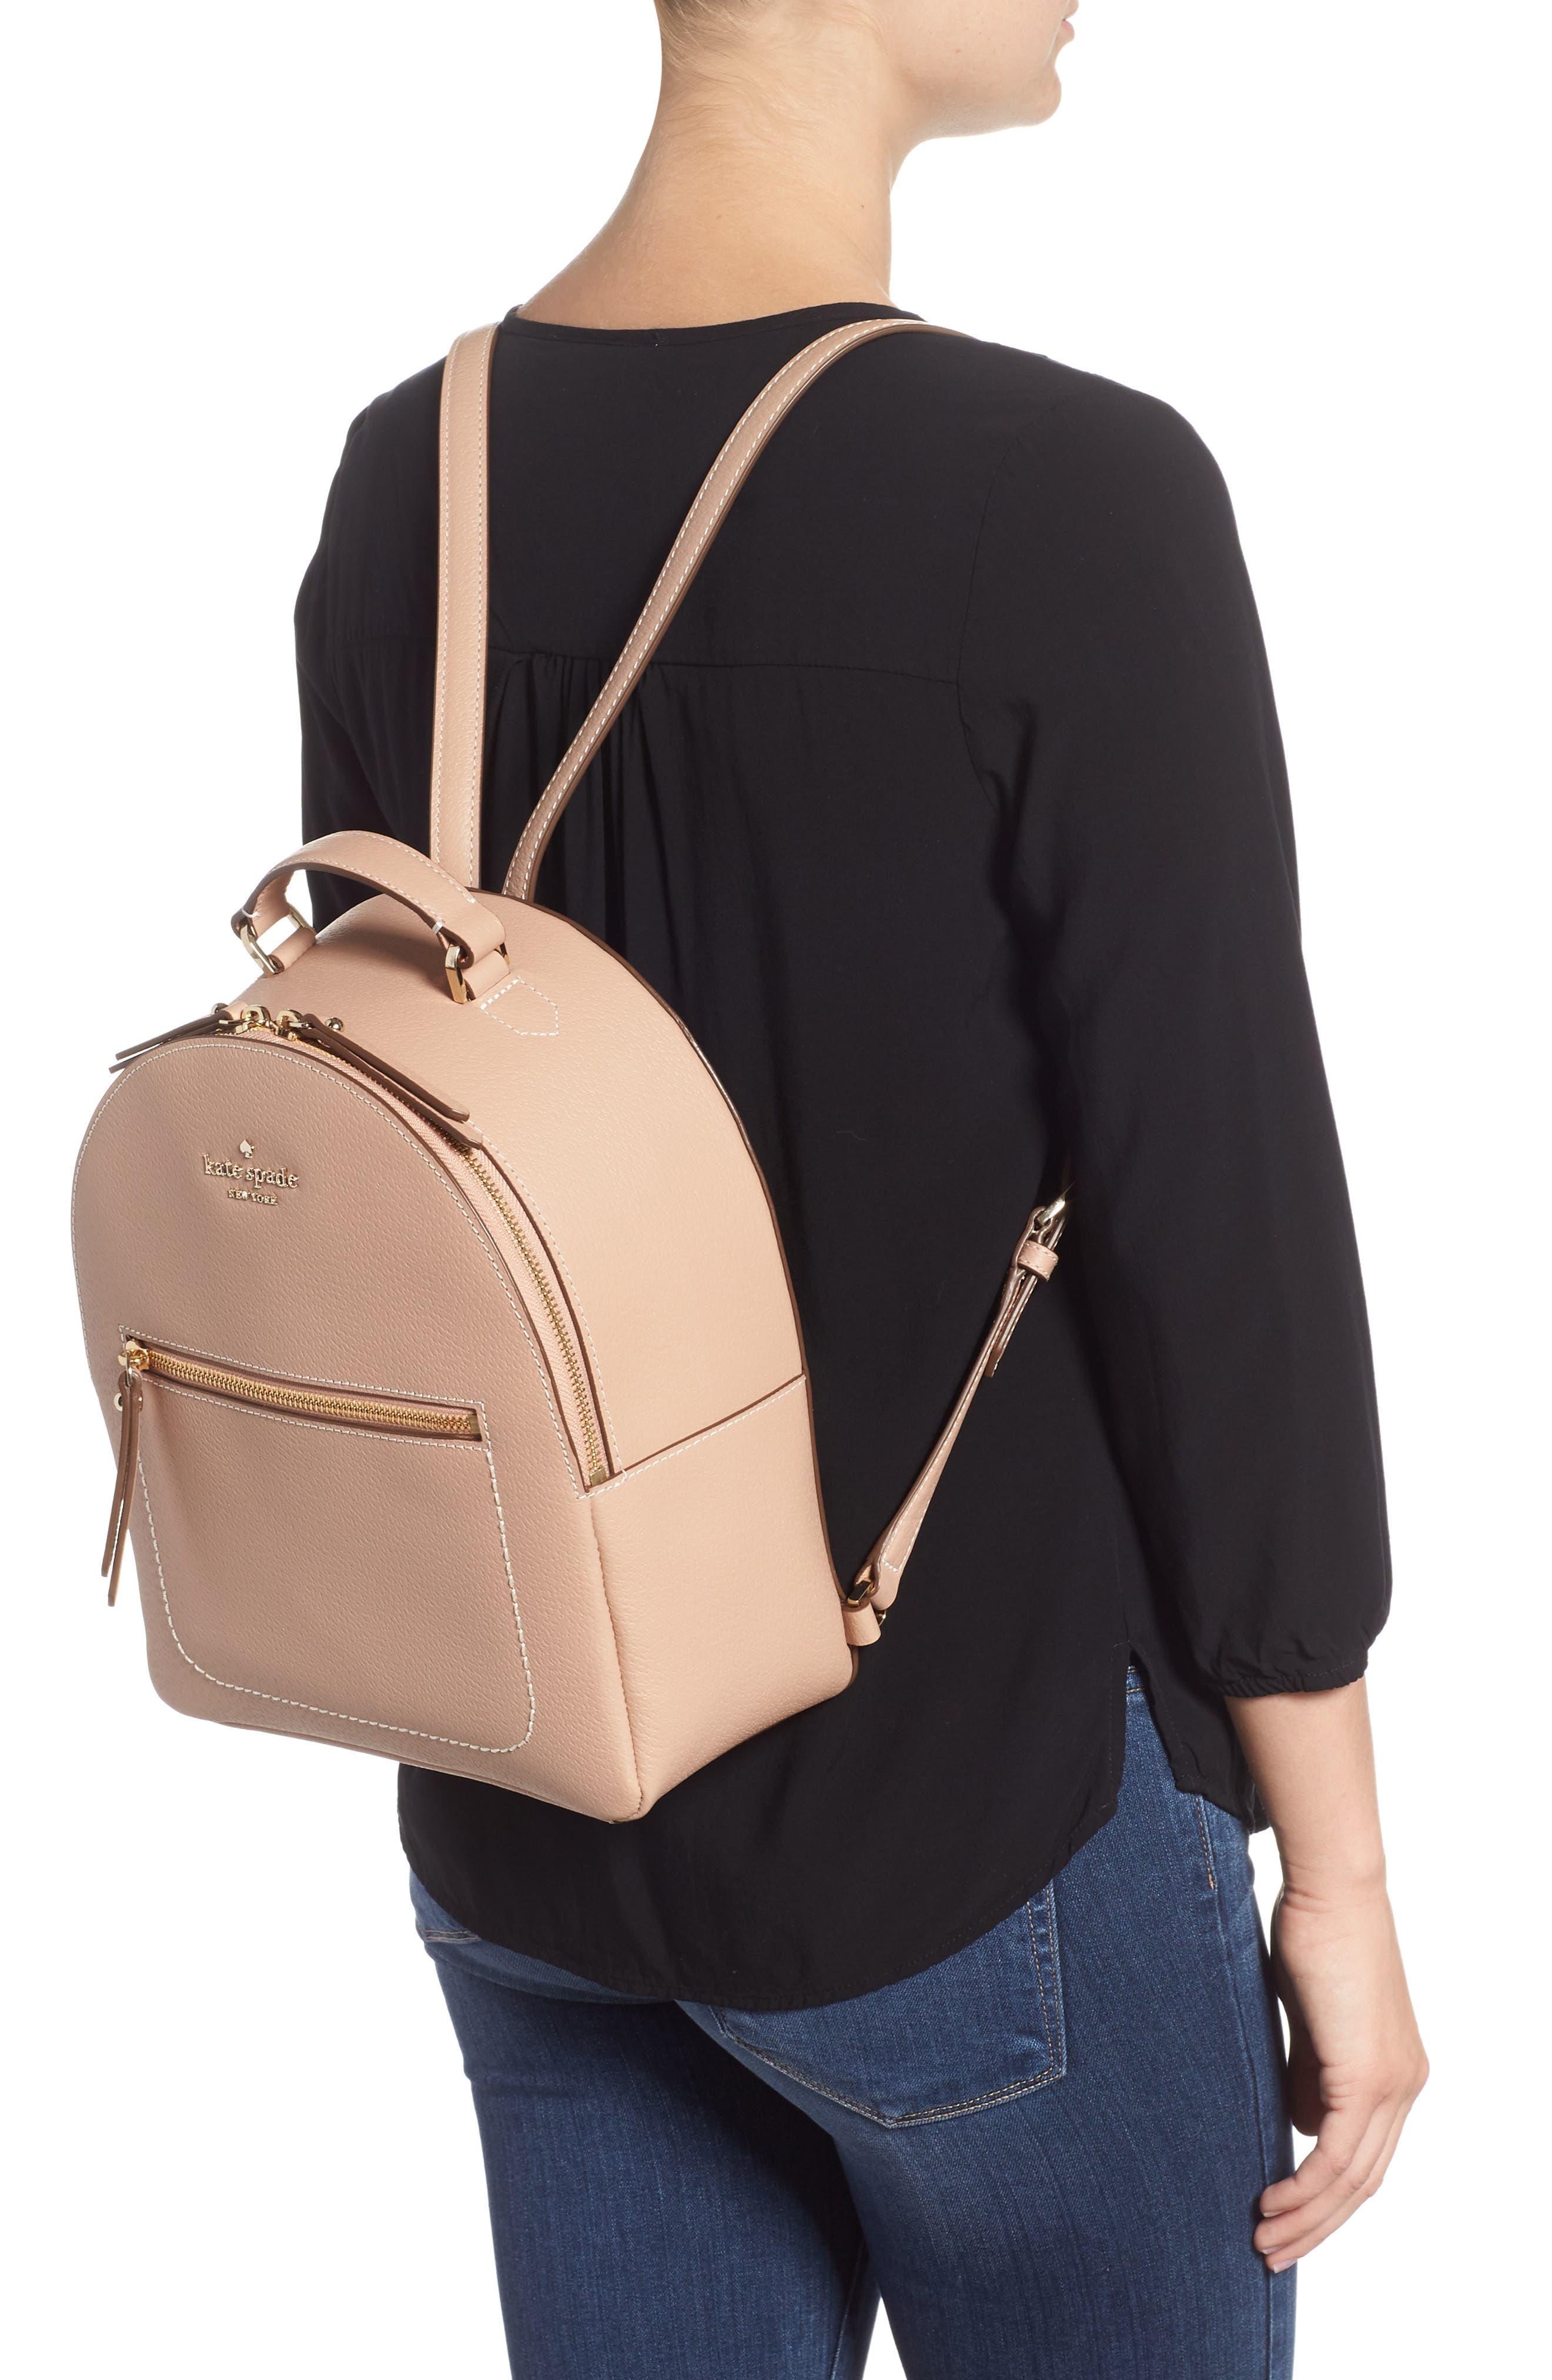 thompson street - brooke leather backpack,                             Alternate thumbnail 2, color,                             Ginger Tea